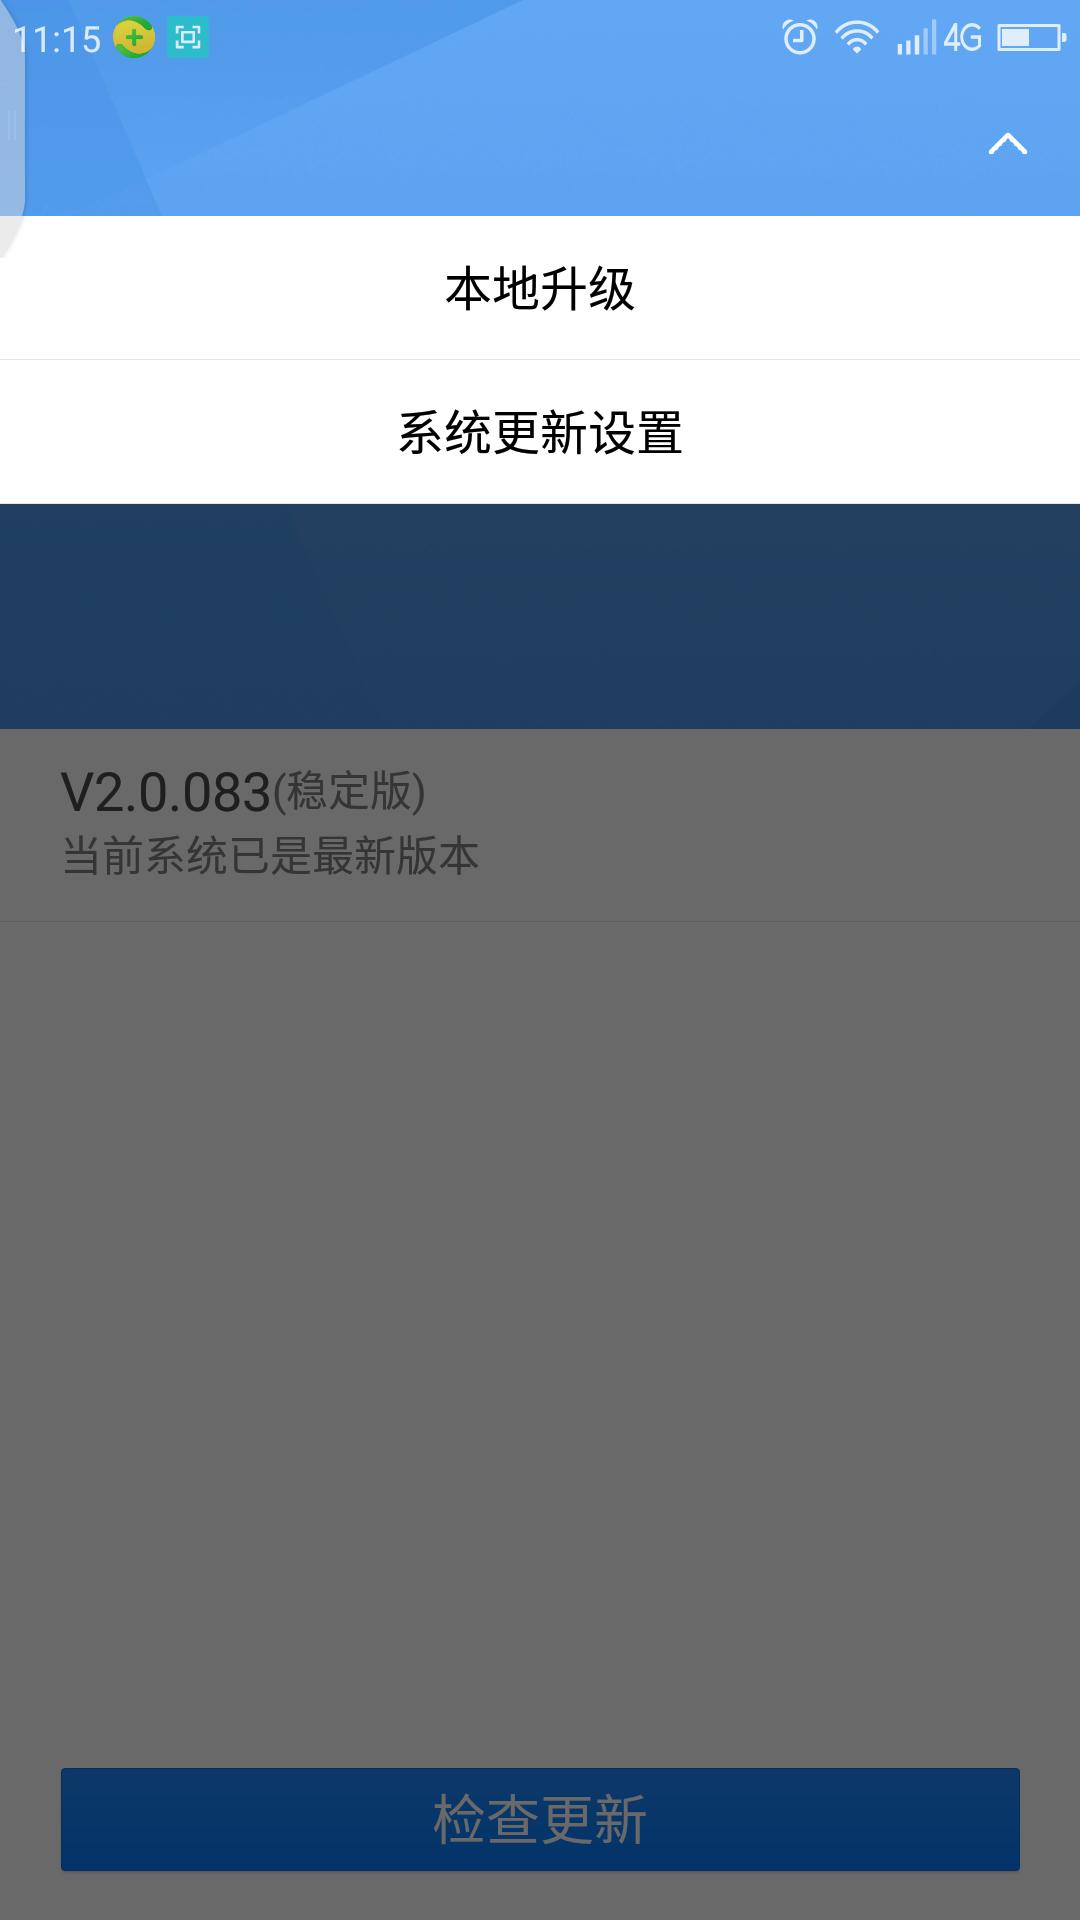 Screenshot_2017-08-01-11-15-54.png